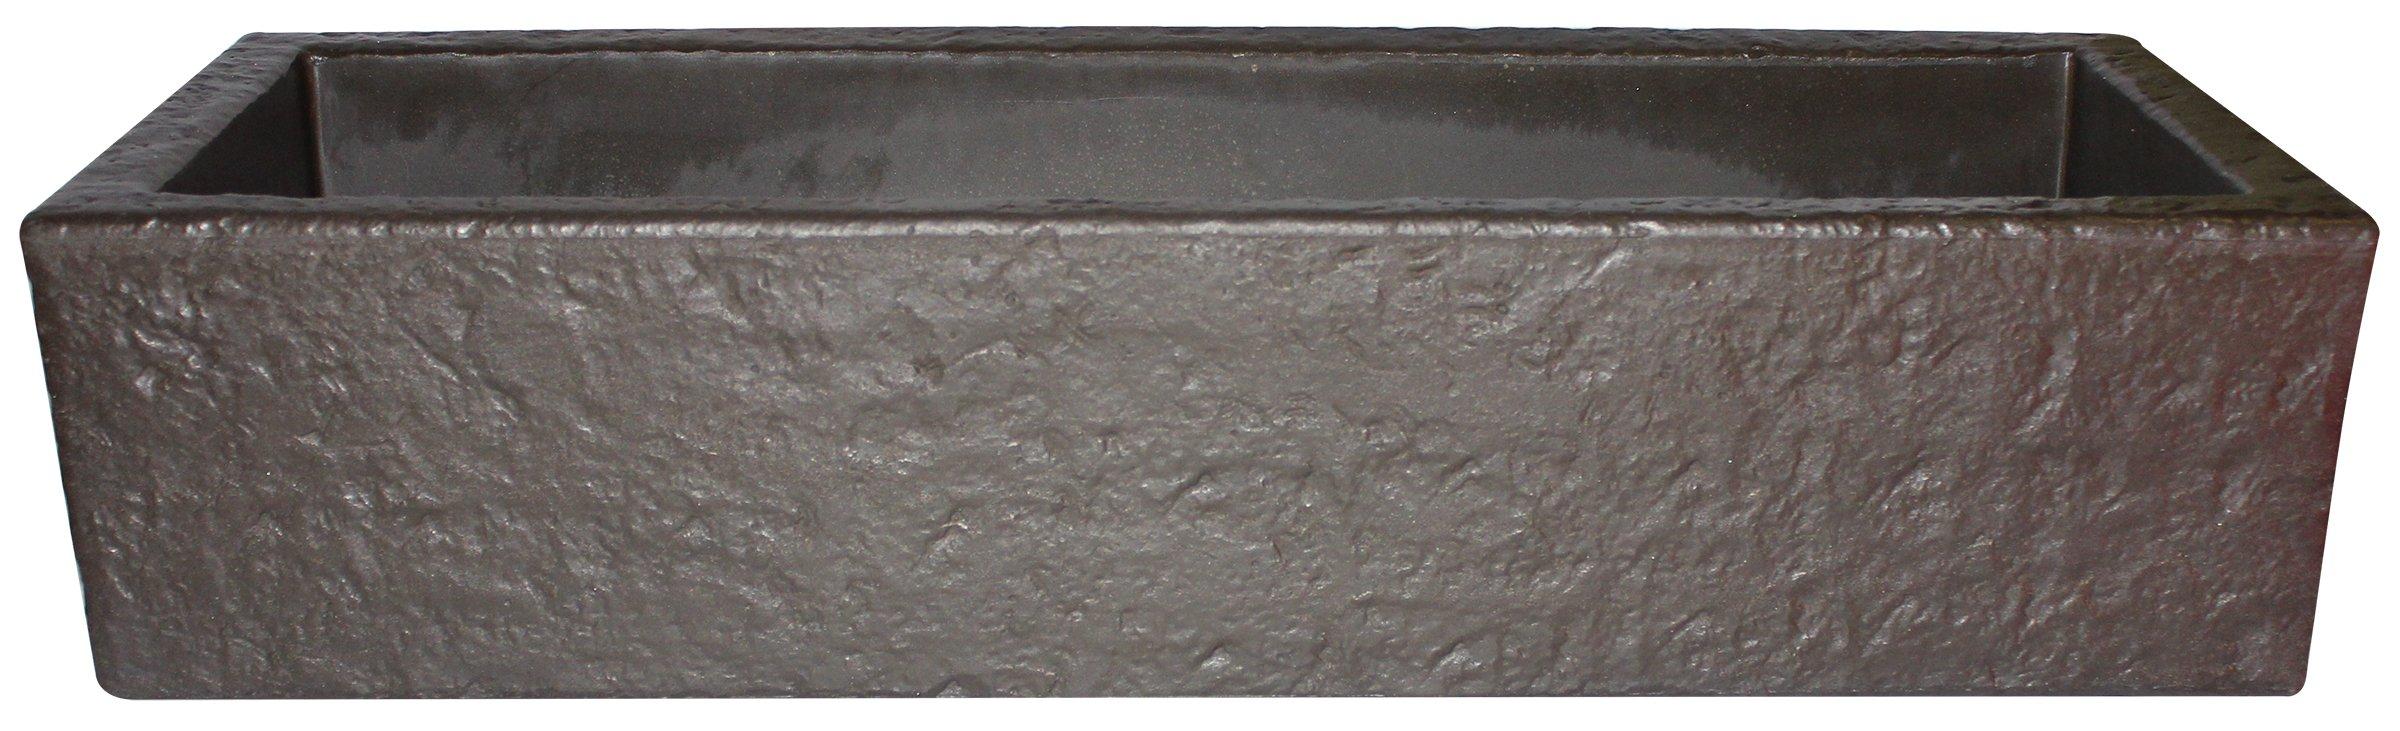 Emsco Group 92415 38'' Weatherproof Resin Trough Window Planter, Bronze by Emsco Group